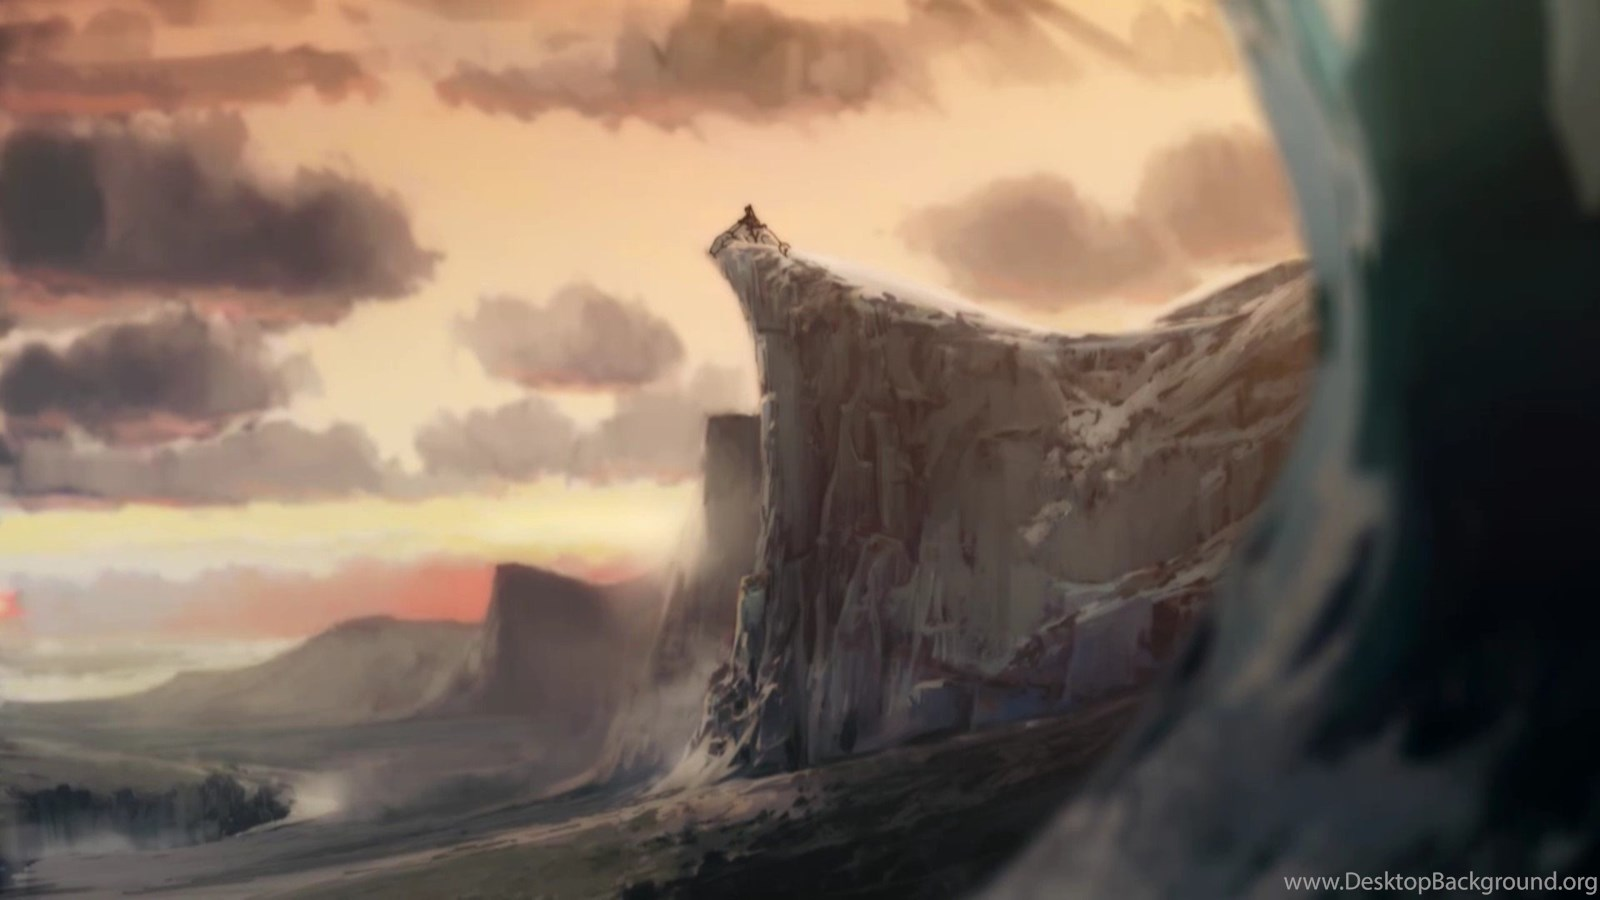 The Legend Of Korra Wallpapers Pictures 23 Hd Wallpaper